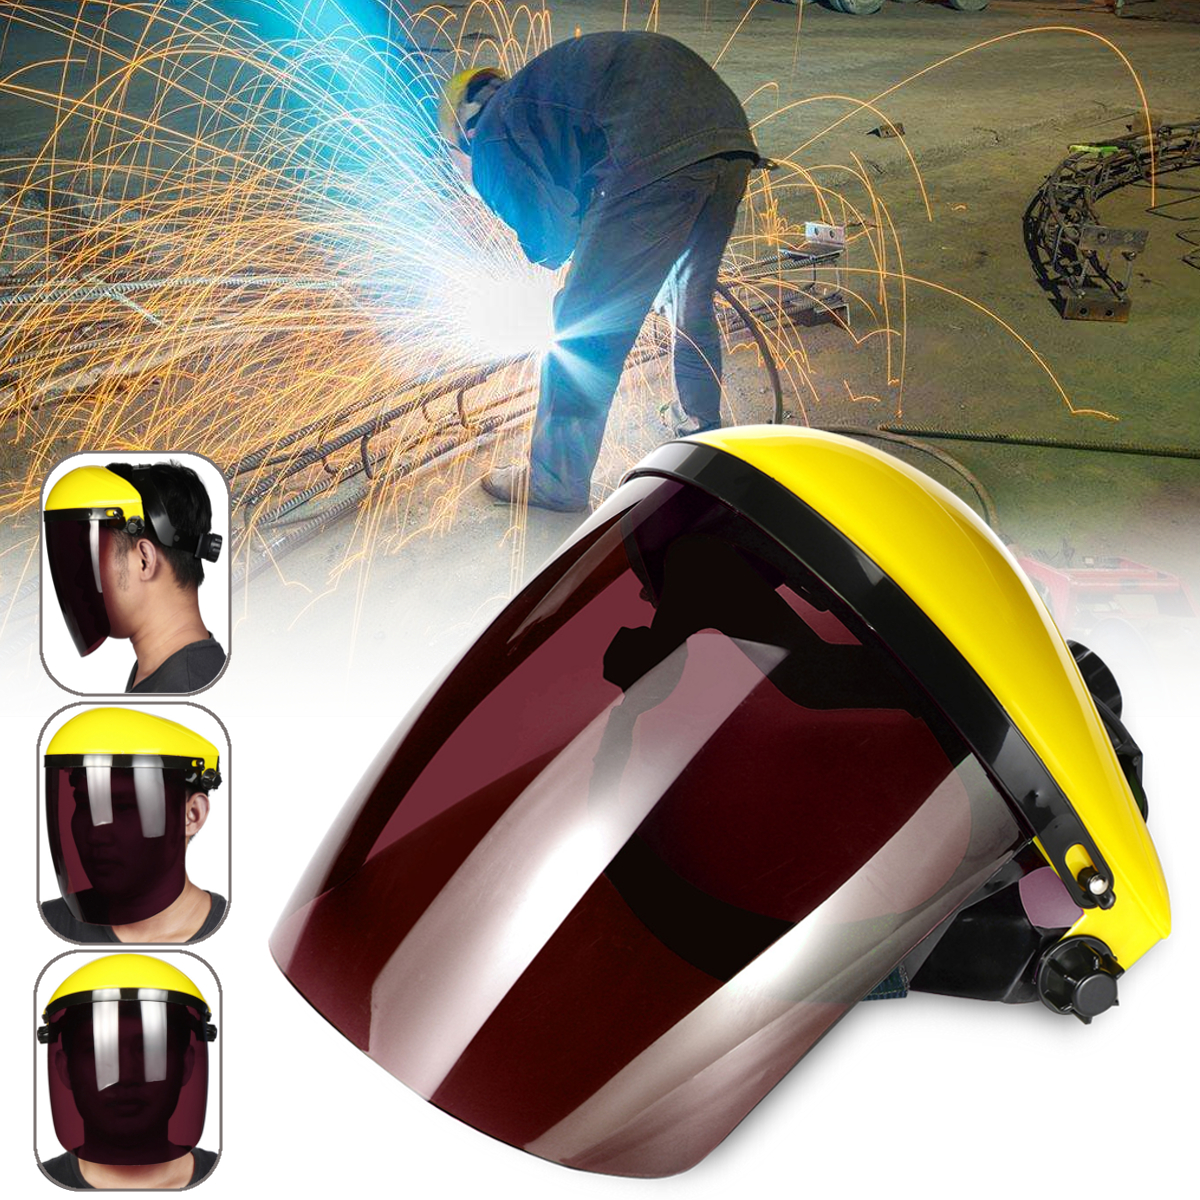 Full Visor Safety Workwear Eye Protection Tool Clear Adjustable Face Mask Shield Gray/Black/Green/Brown Protective Flip-up Visor